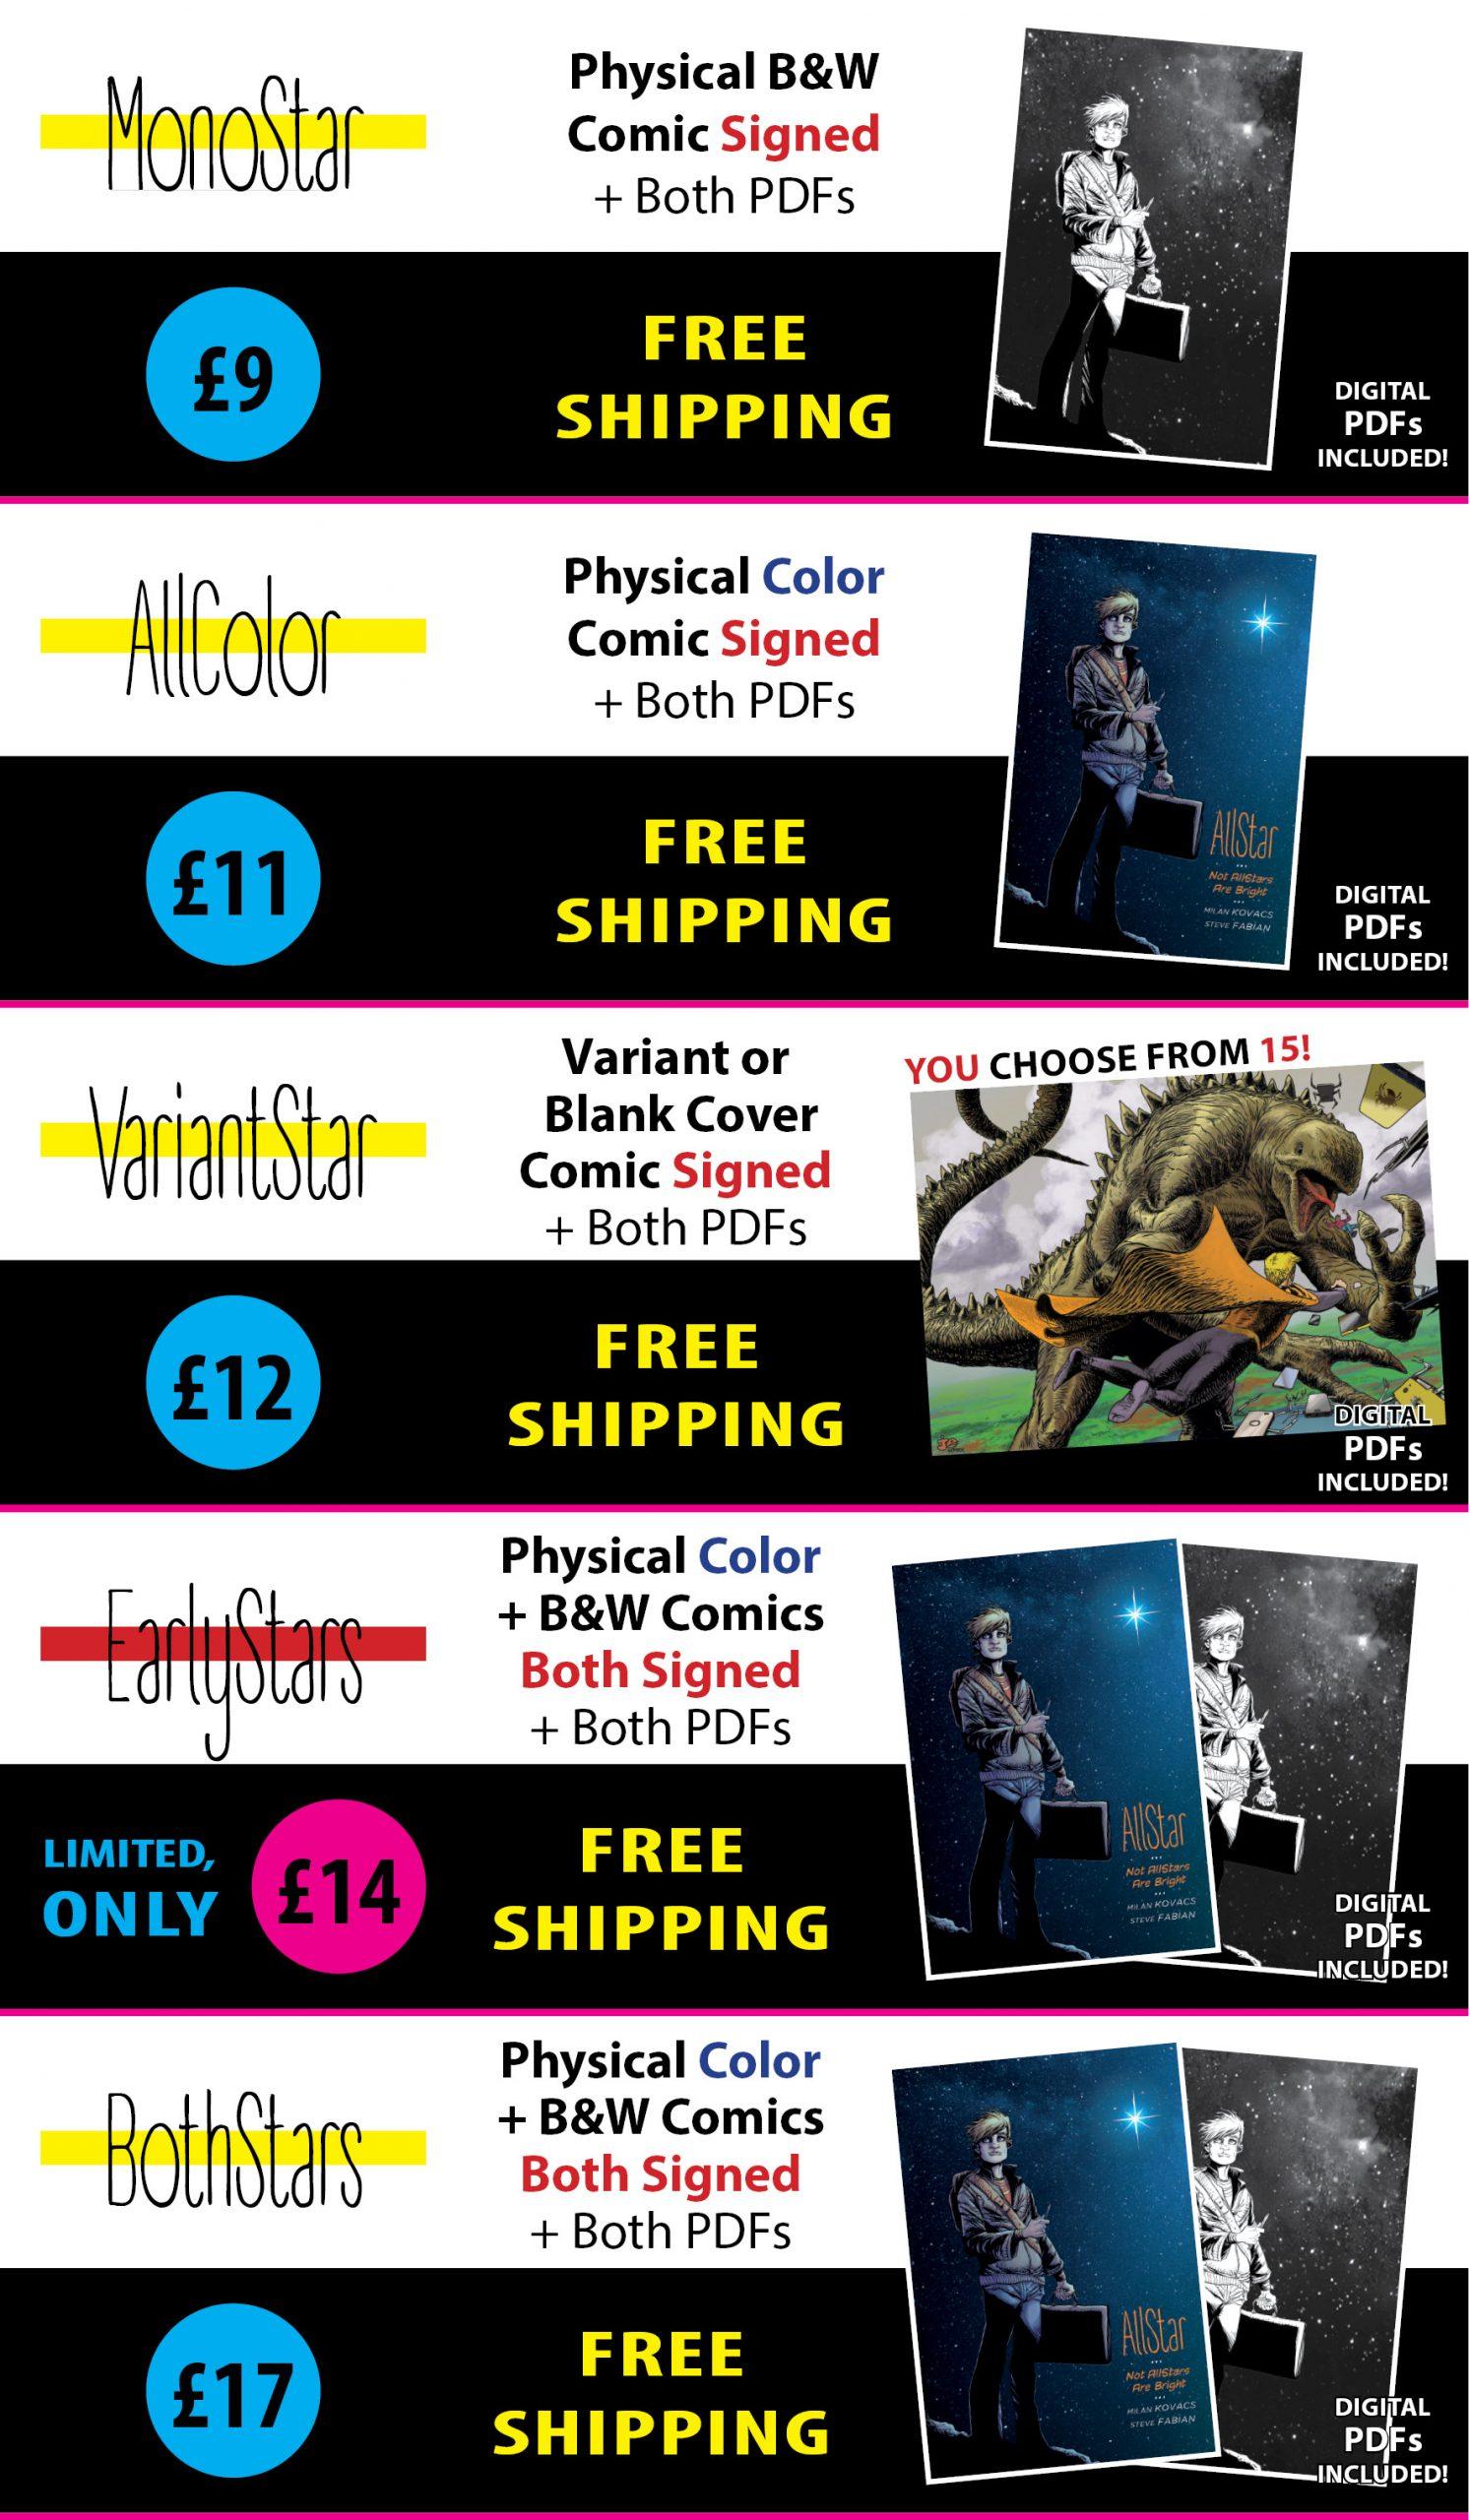 Kickstarter-Rewards-Physical